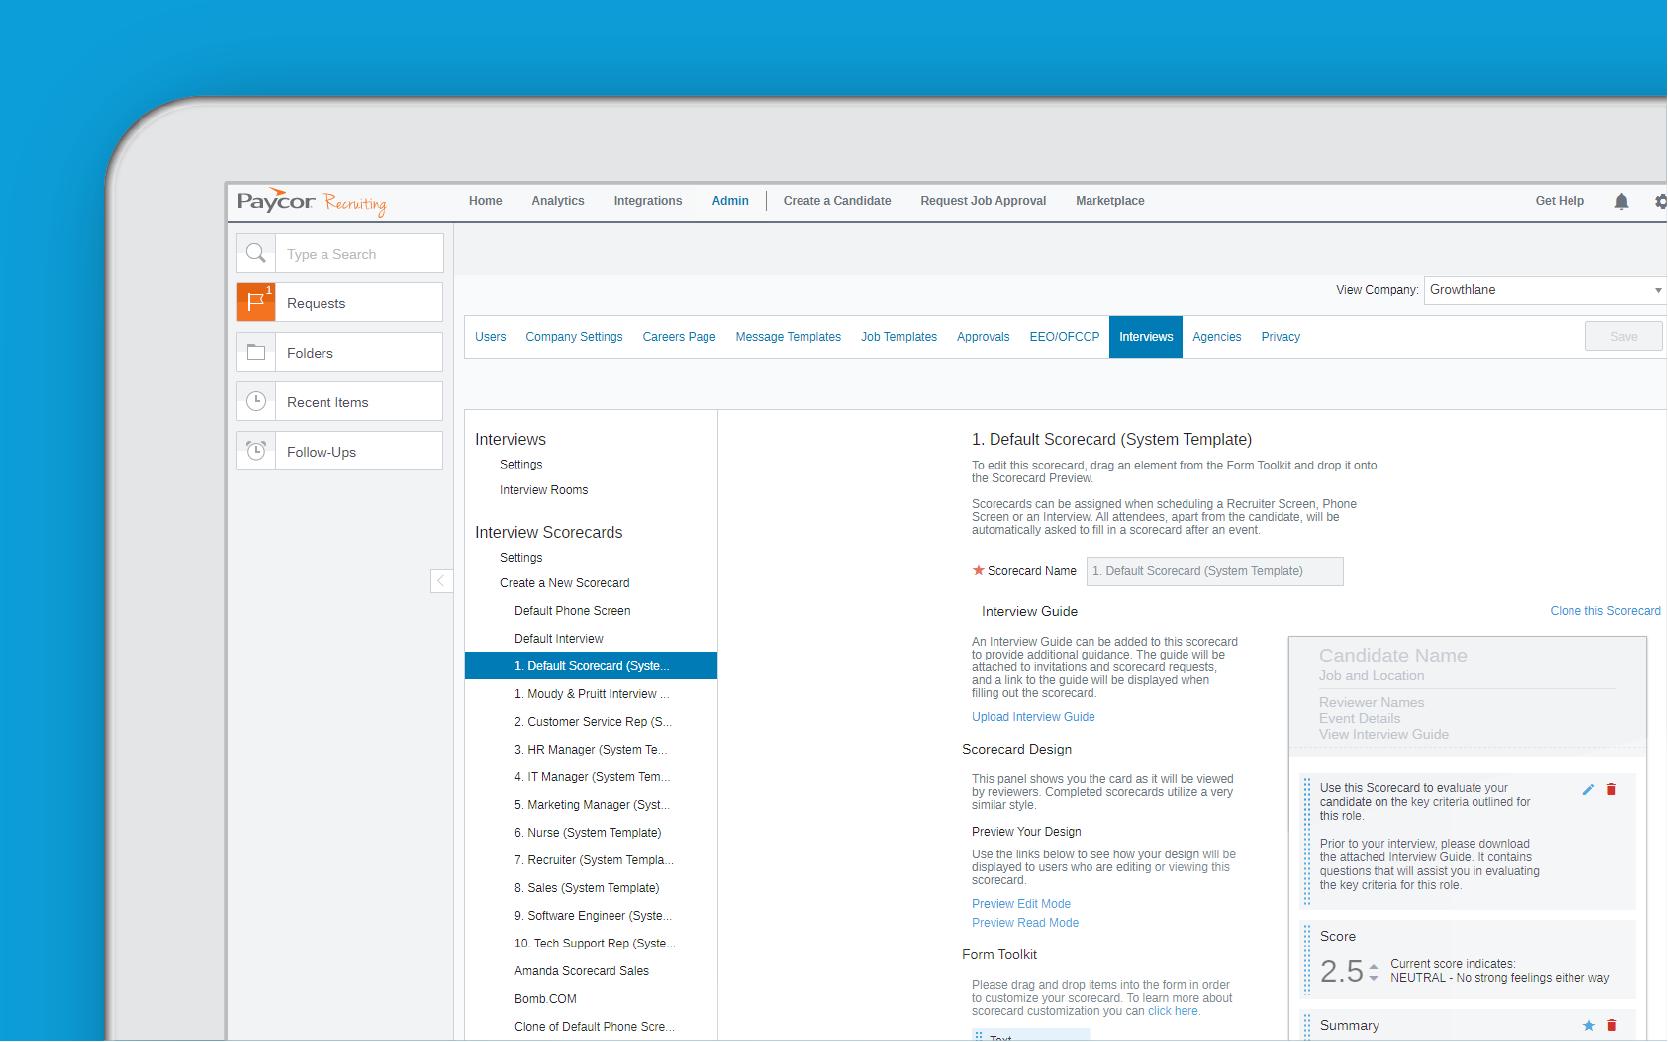 Corner of a tablet showing remote hiring dashboard against blue background